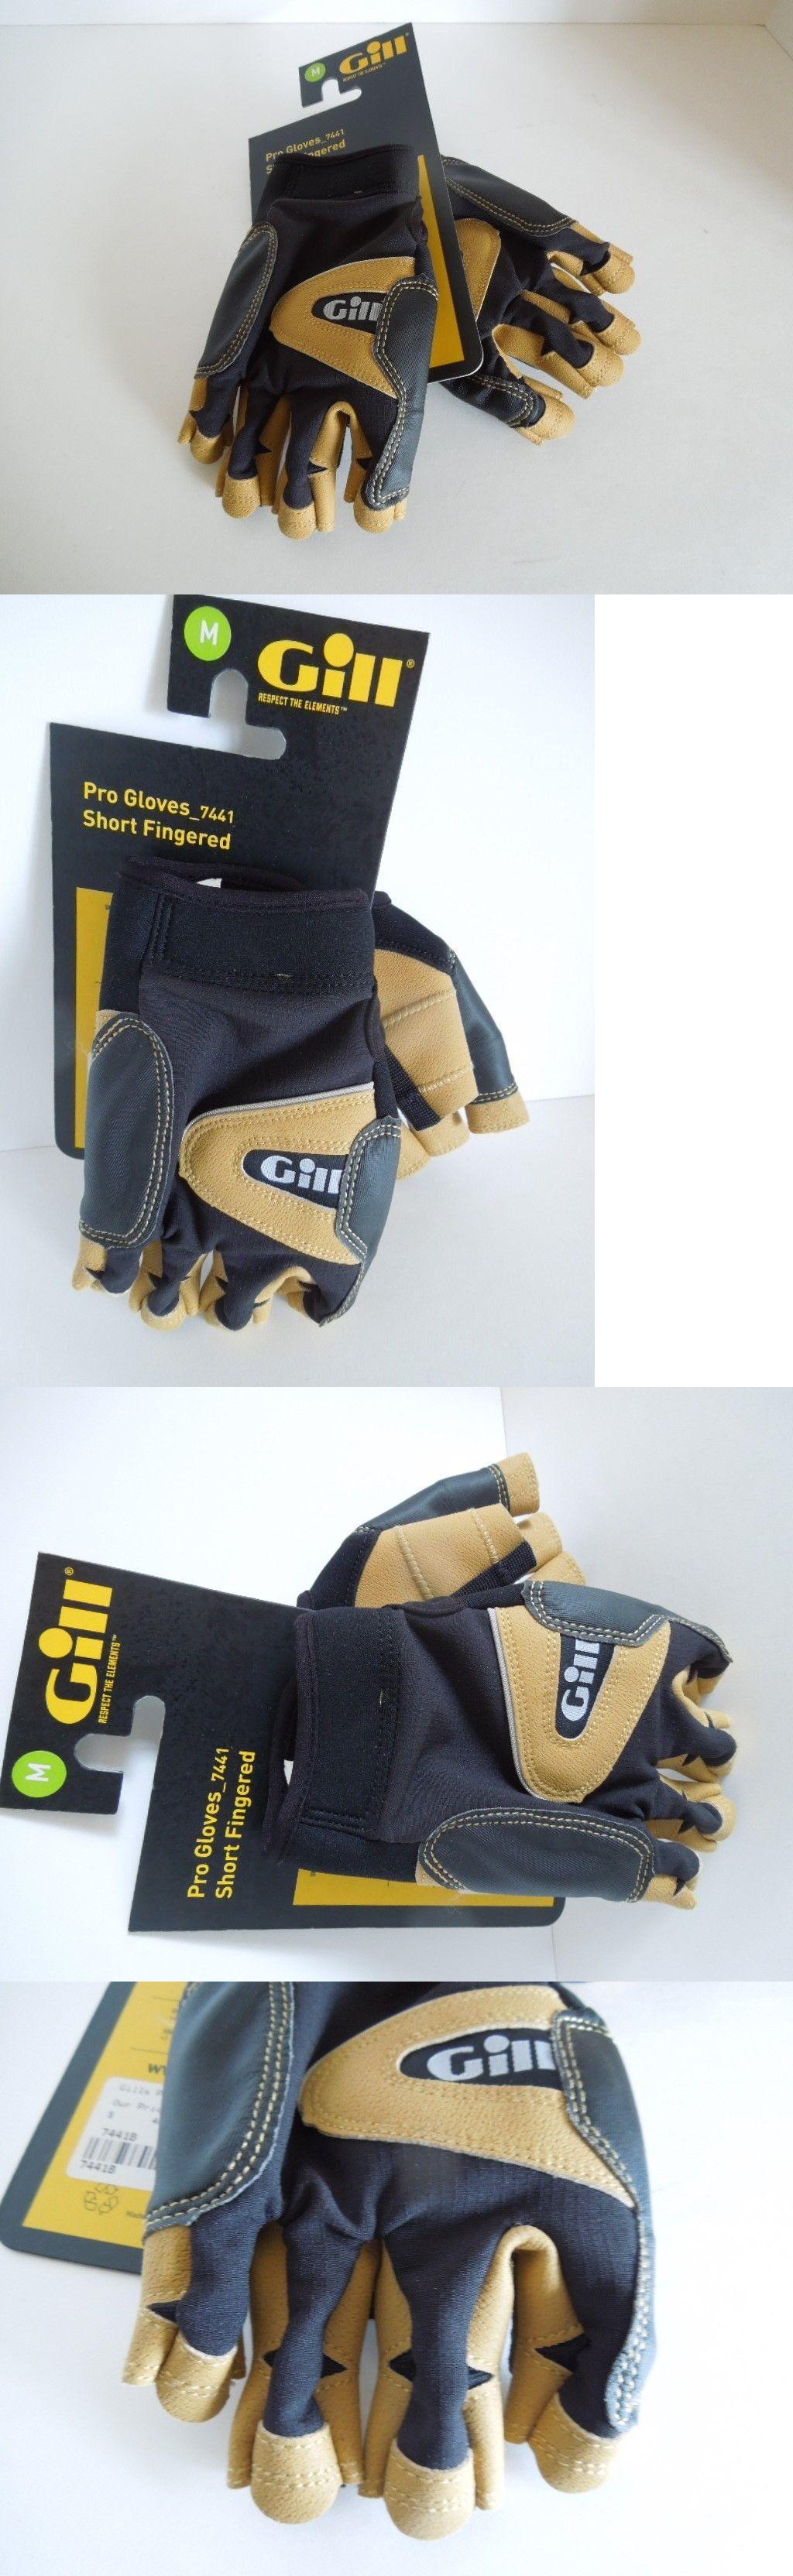 Gloves gill short finger pro gloves medium black brand